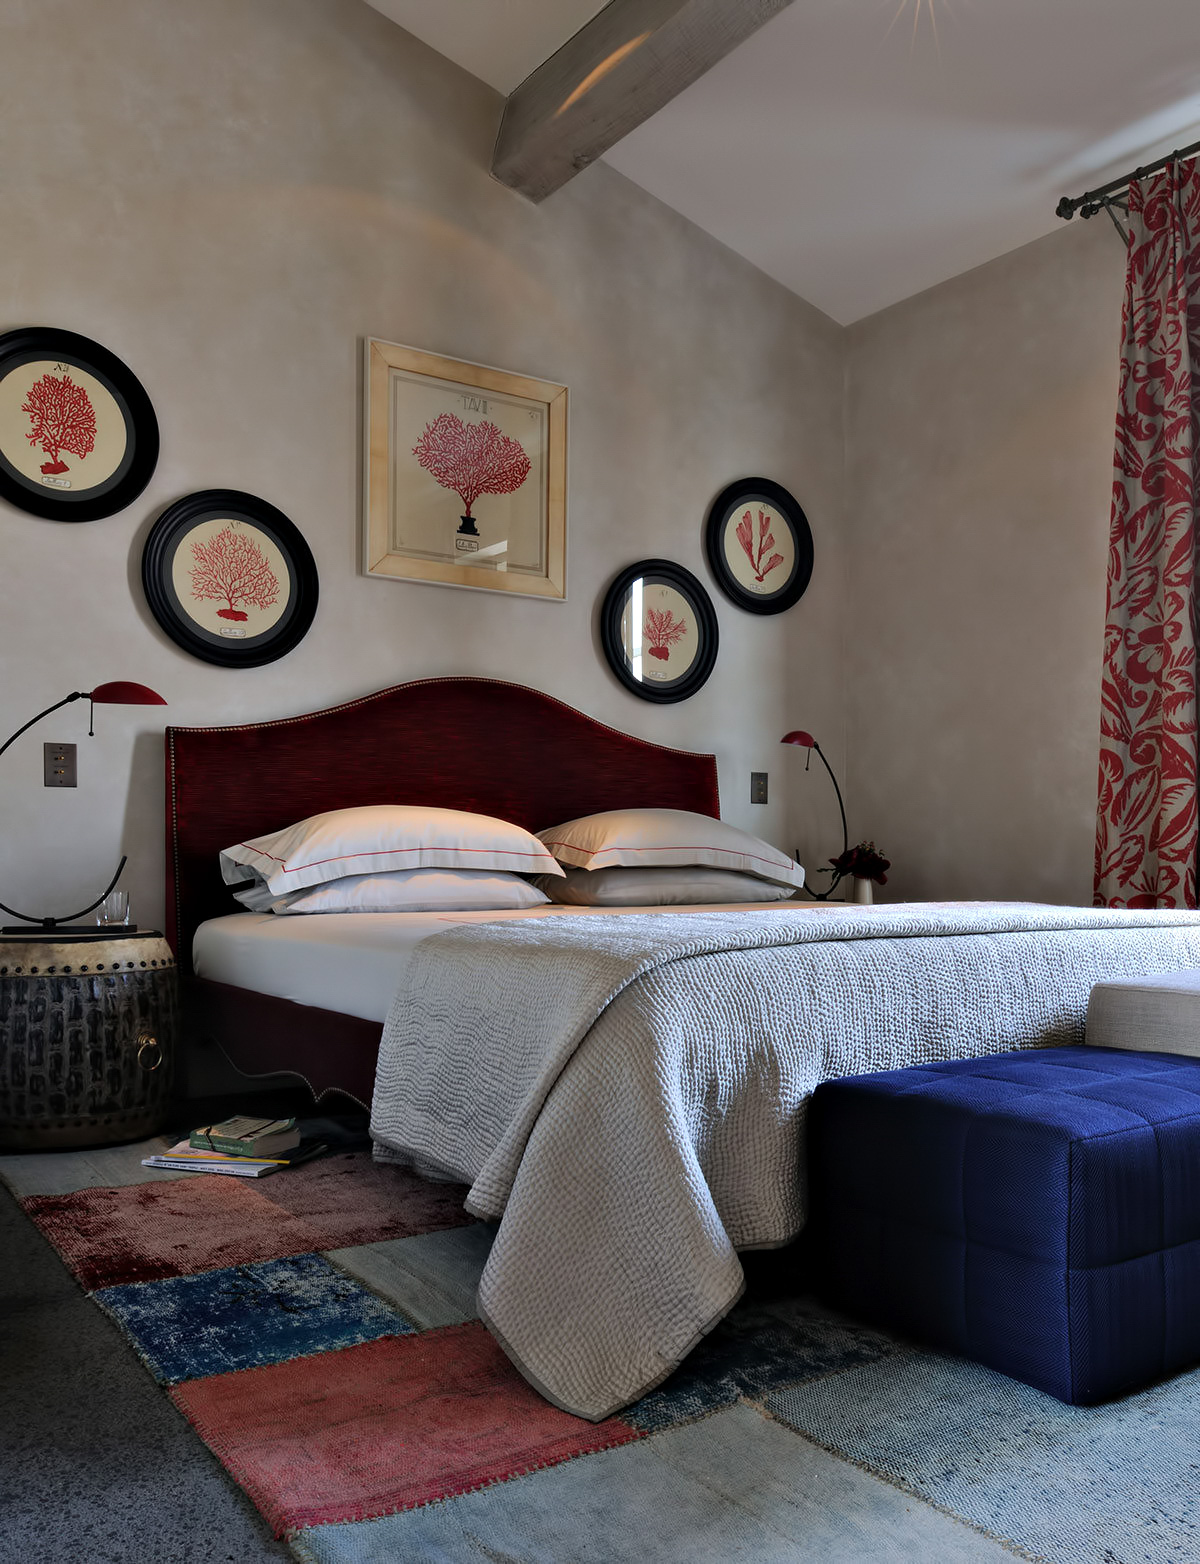 Peninsula Villa – Saint-Tropez, Provence-Alpes-Côte d'Azur, France